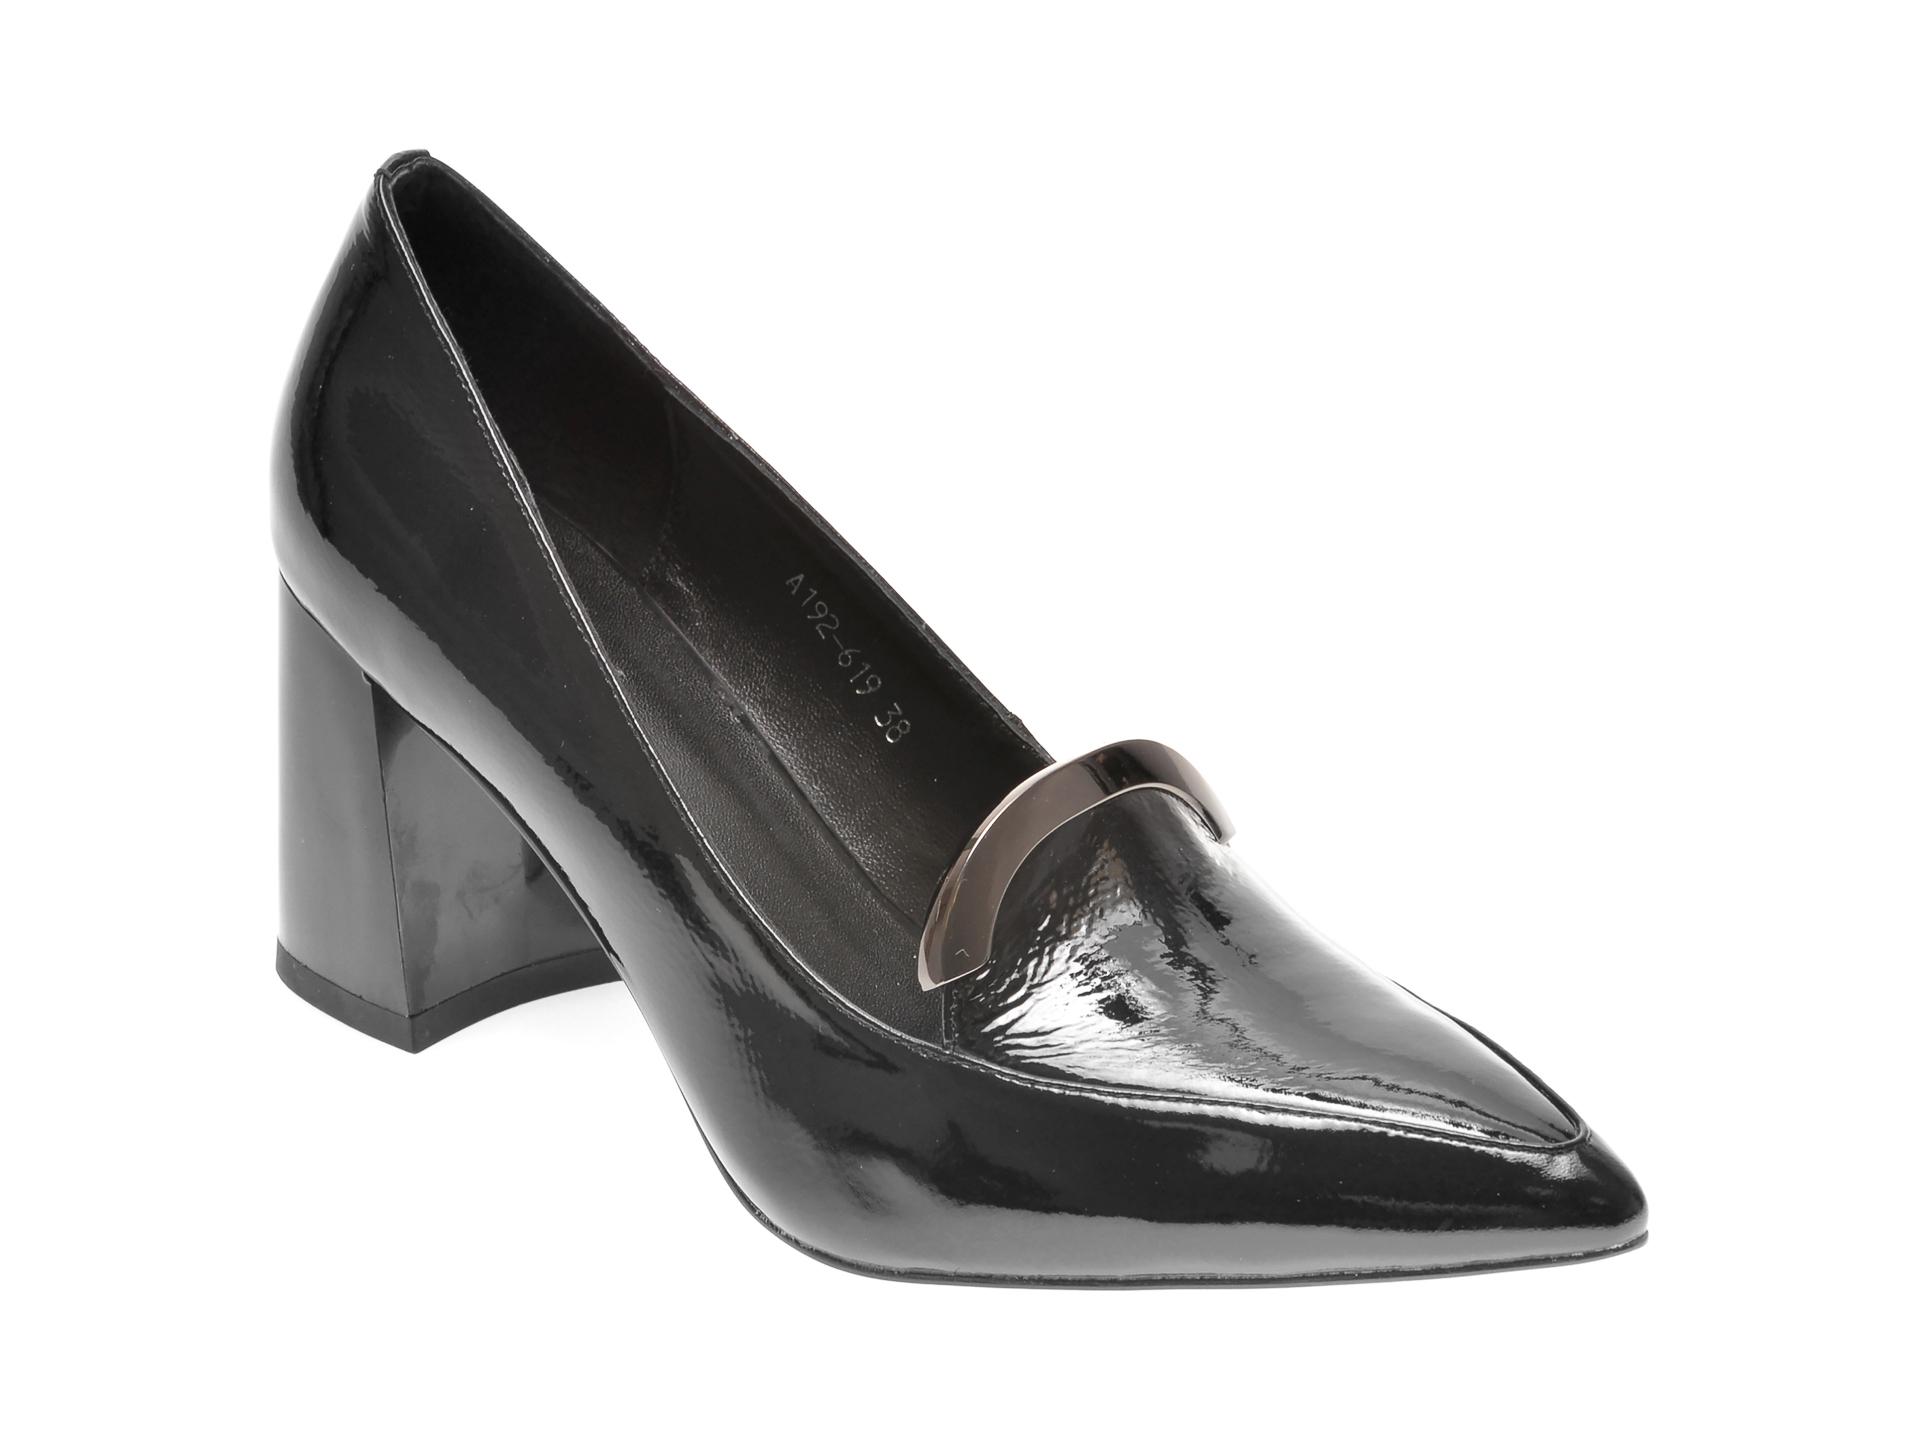 Pantofi EPICA negri, A192619, din piele naturala lacuita imagine otter.ro 2021